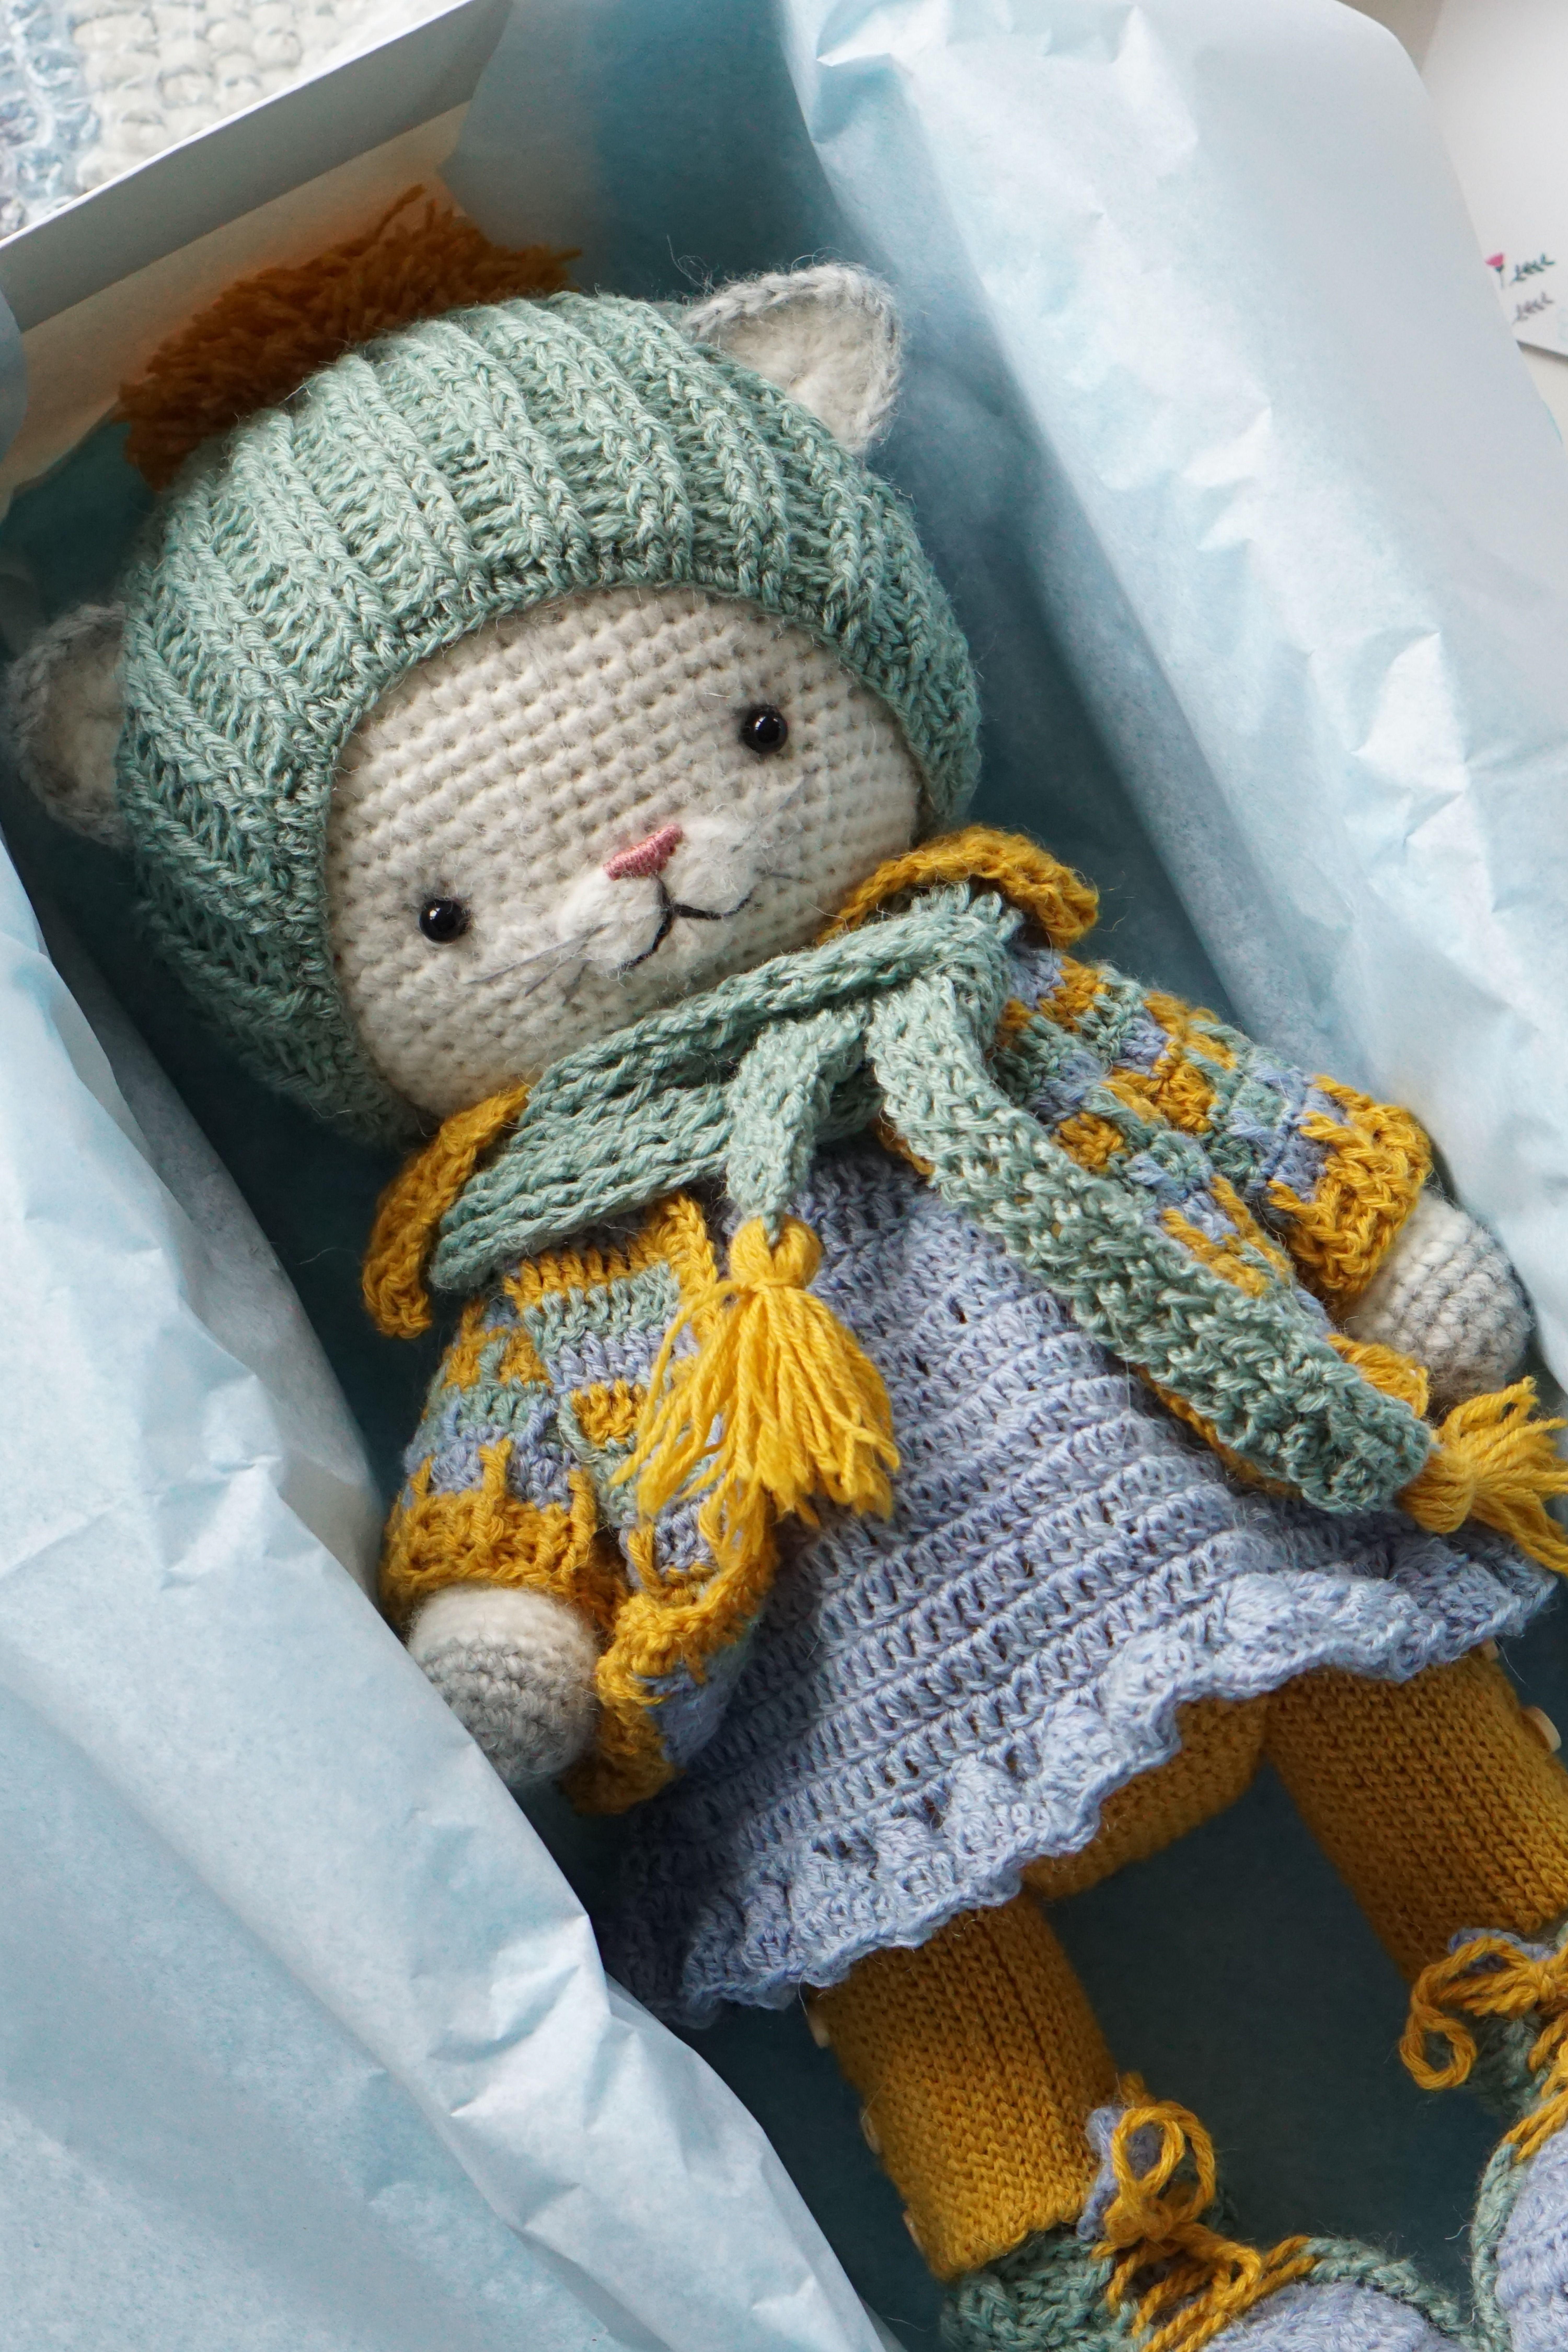 Baby Knitting Patterns Crochet Zipzip Bunny Free Pattern- Crochet ... | 9000x6000